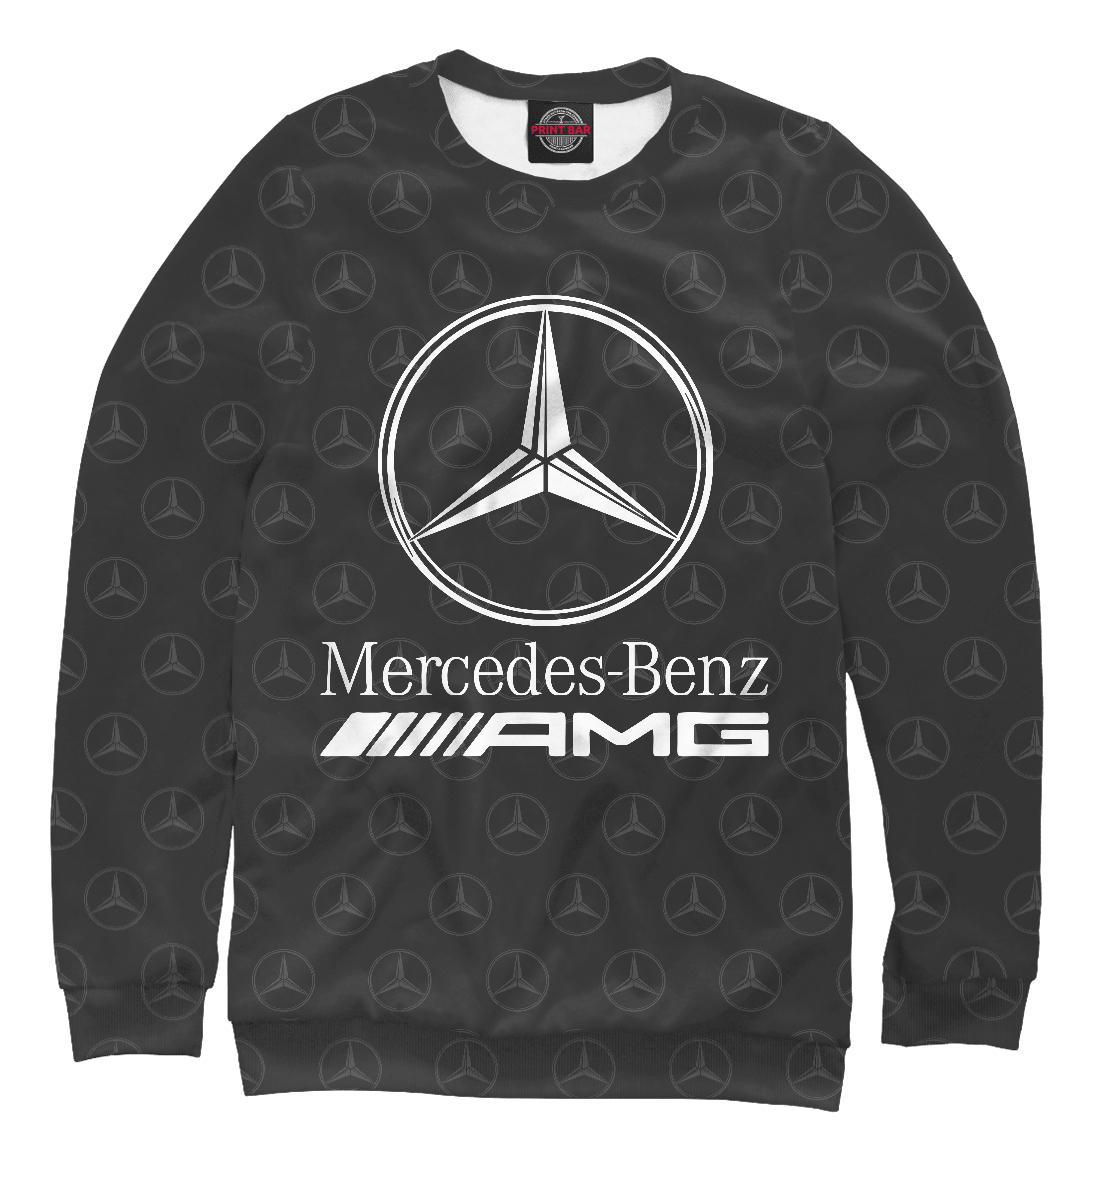 Купить Mercedes-Benz AMG Premium, Printbar, Свитшоты, MER-425413-swi-1